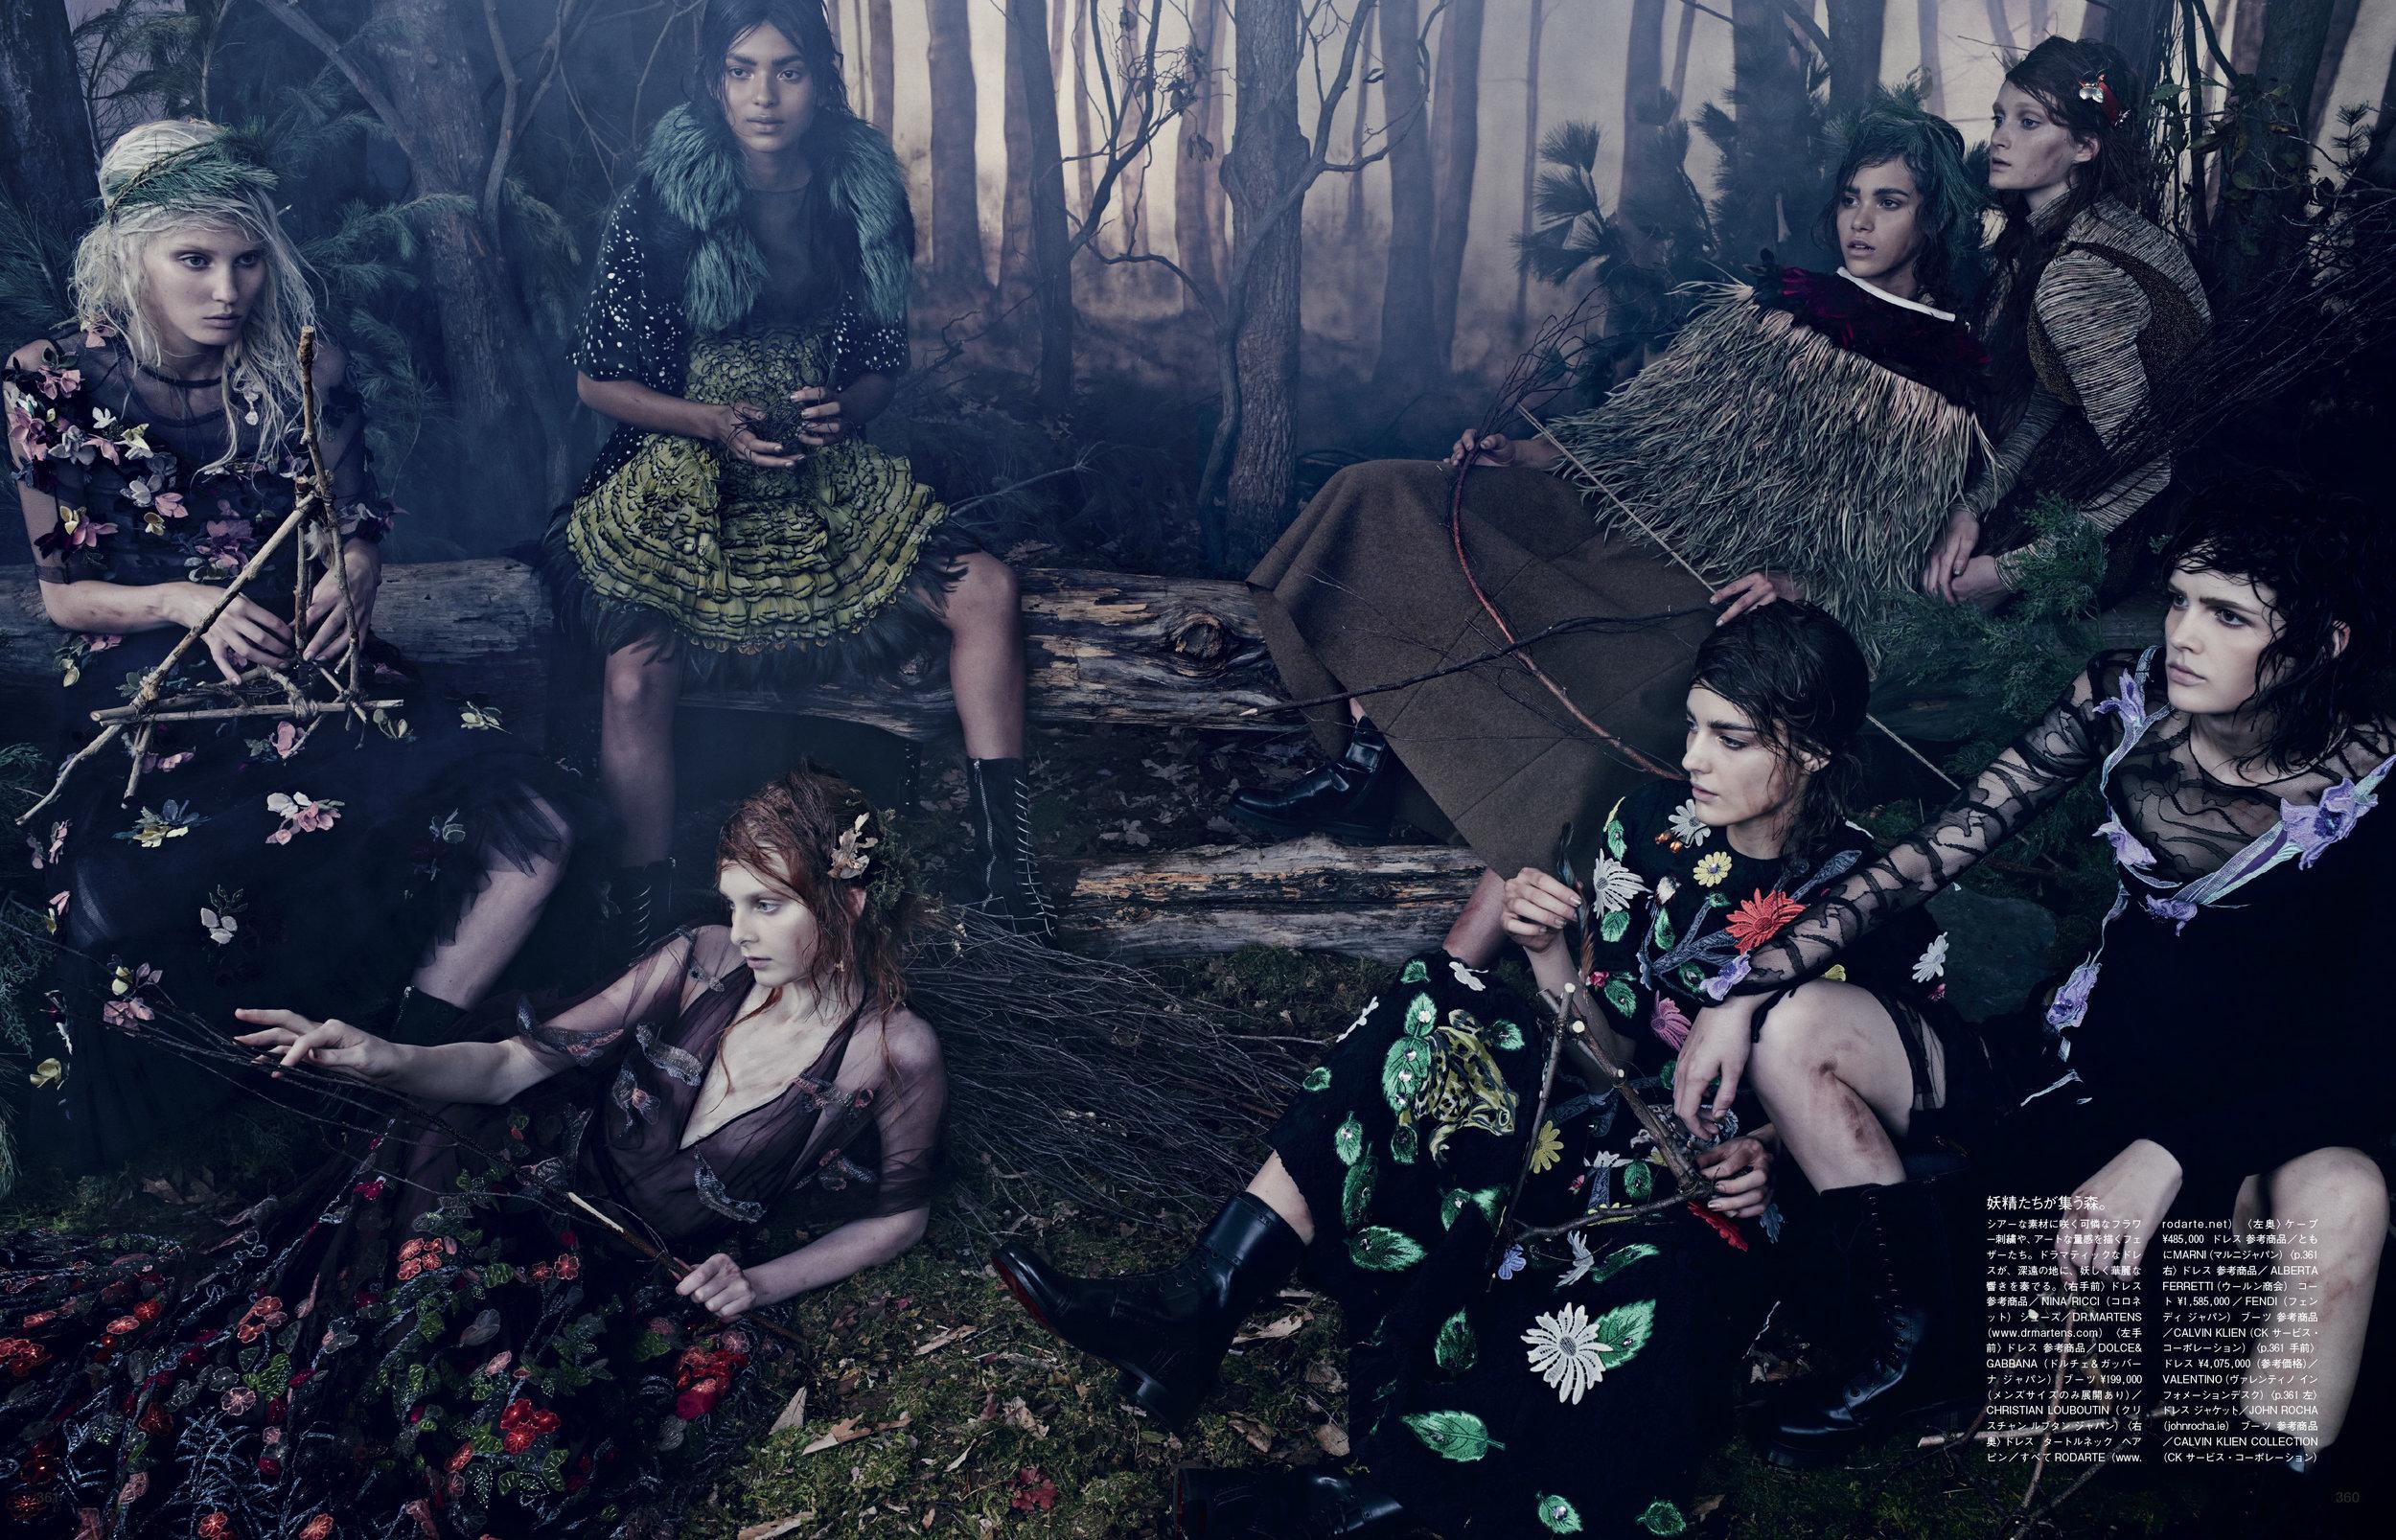 Giovanna-Battaglia-Into-The-Woods-Vogue-Japan-Emma-Summerton-09.jpg